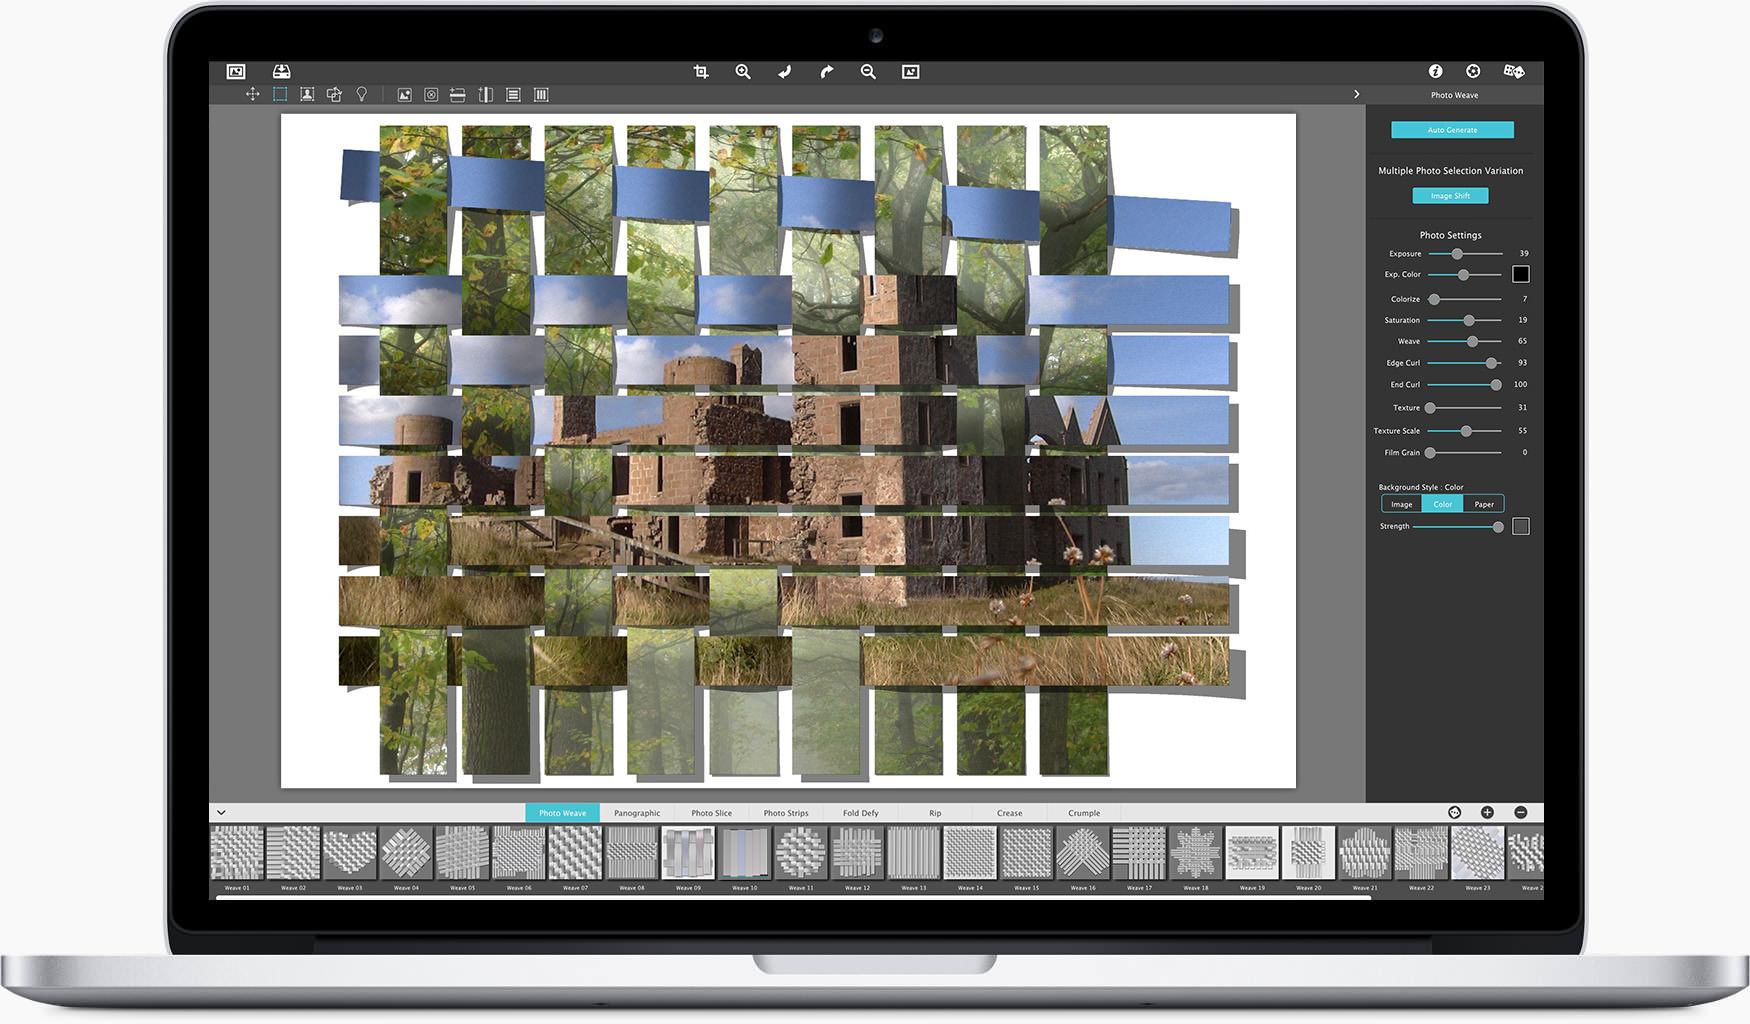 JixiPix Photo Formation Pro 1.0.16 Mac 破解版 3D创意照片效果制作工具